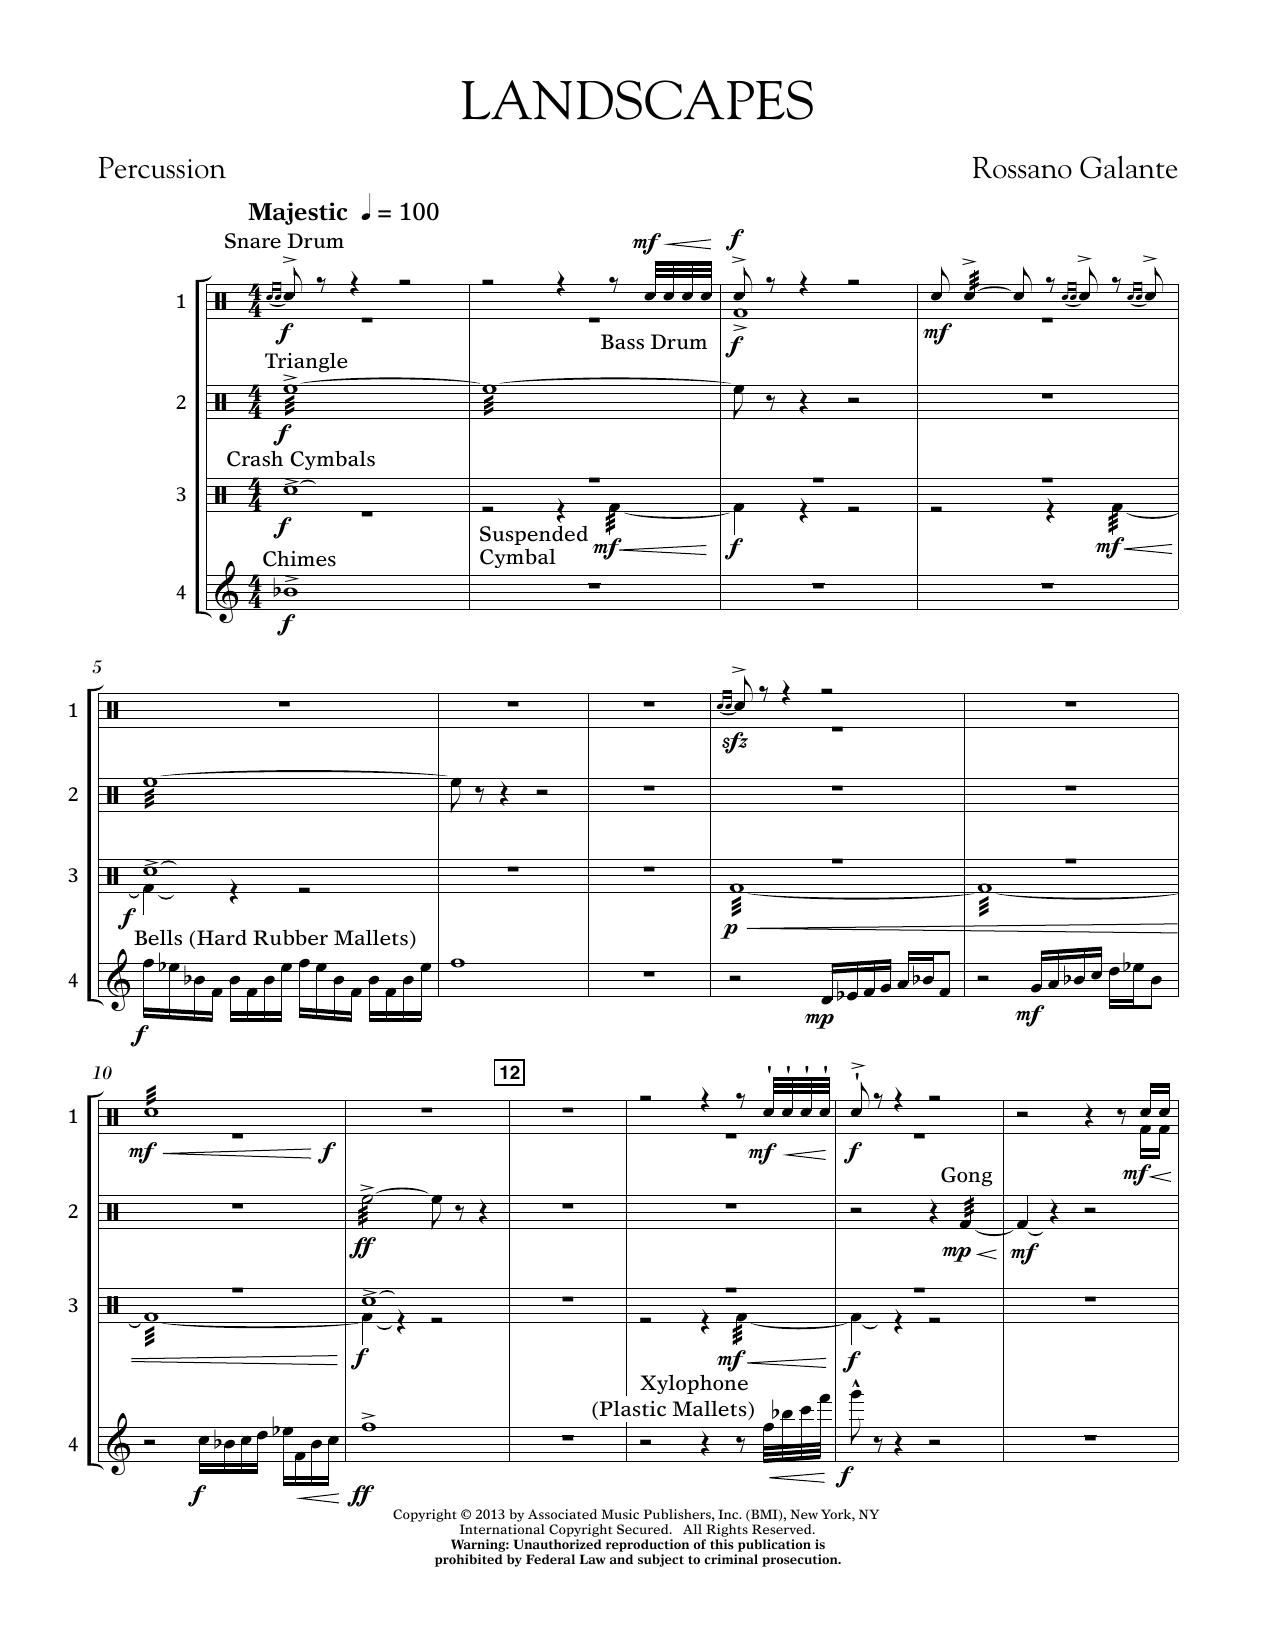 Rosanno Galante Landscapes - Percussion Score sheet music notes printable PDF score